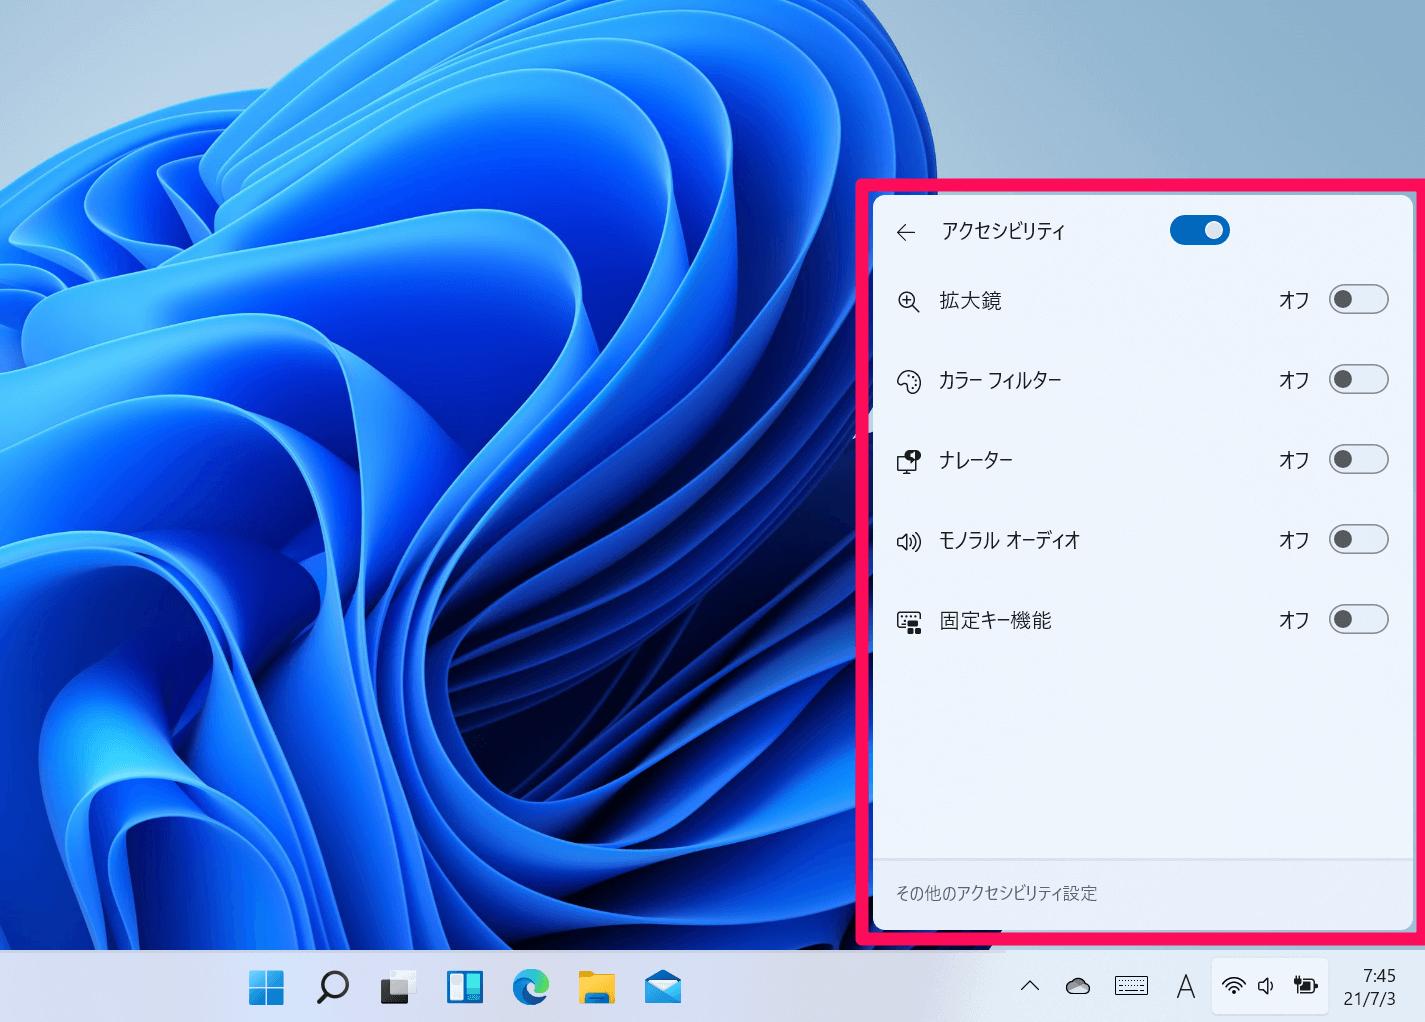 Windows 11 Insider Previewの概要